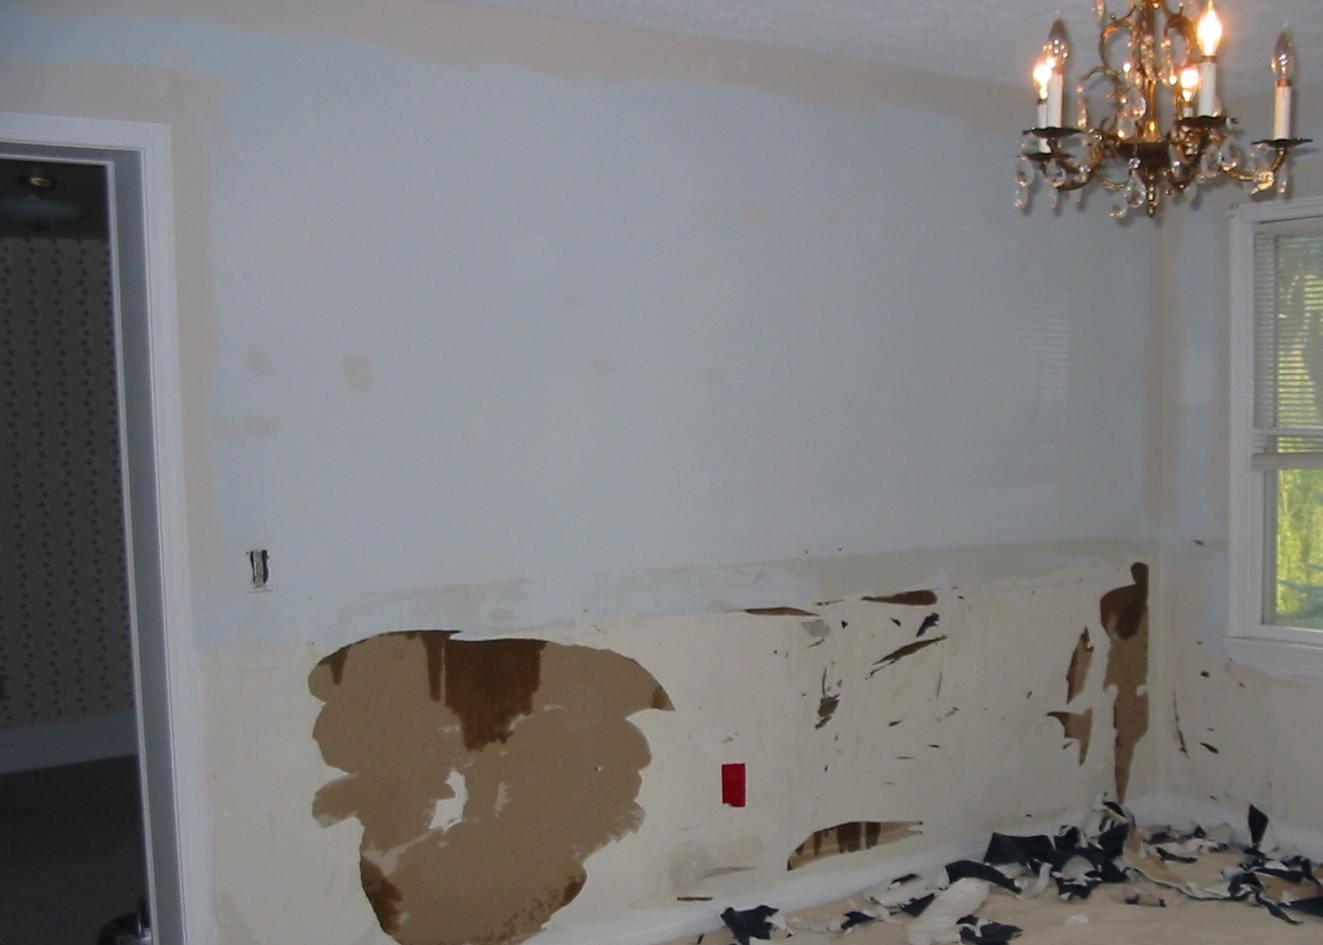 Sampoerna Wallpaper wallpaper removers 1323x945